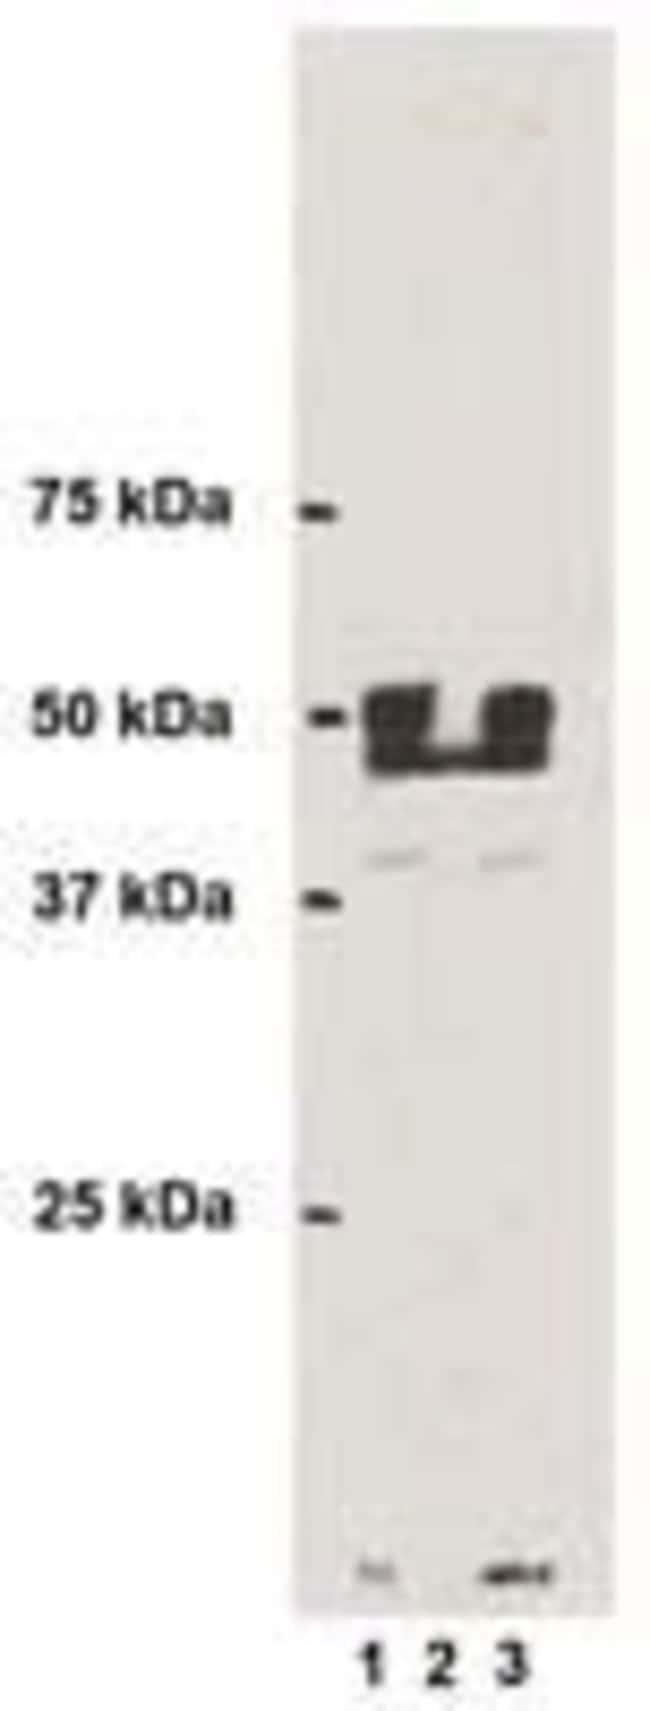 3-Nitrotyrosine Mouse anti-Chemical, Clone: 2A12, Invitrogen 100 μg;